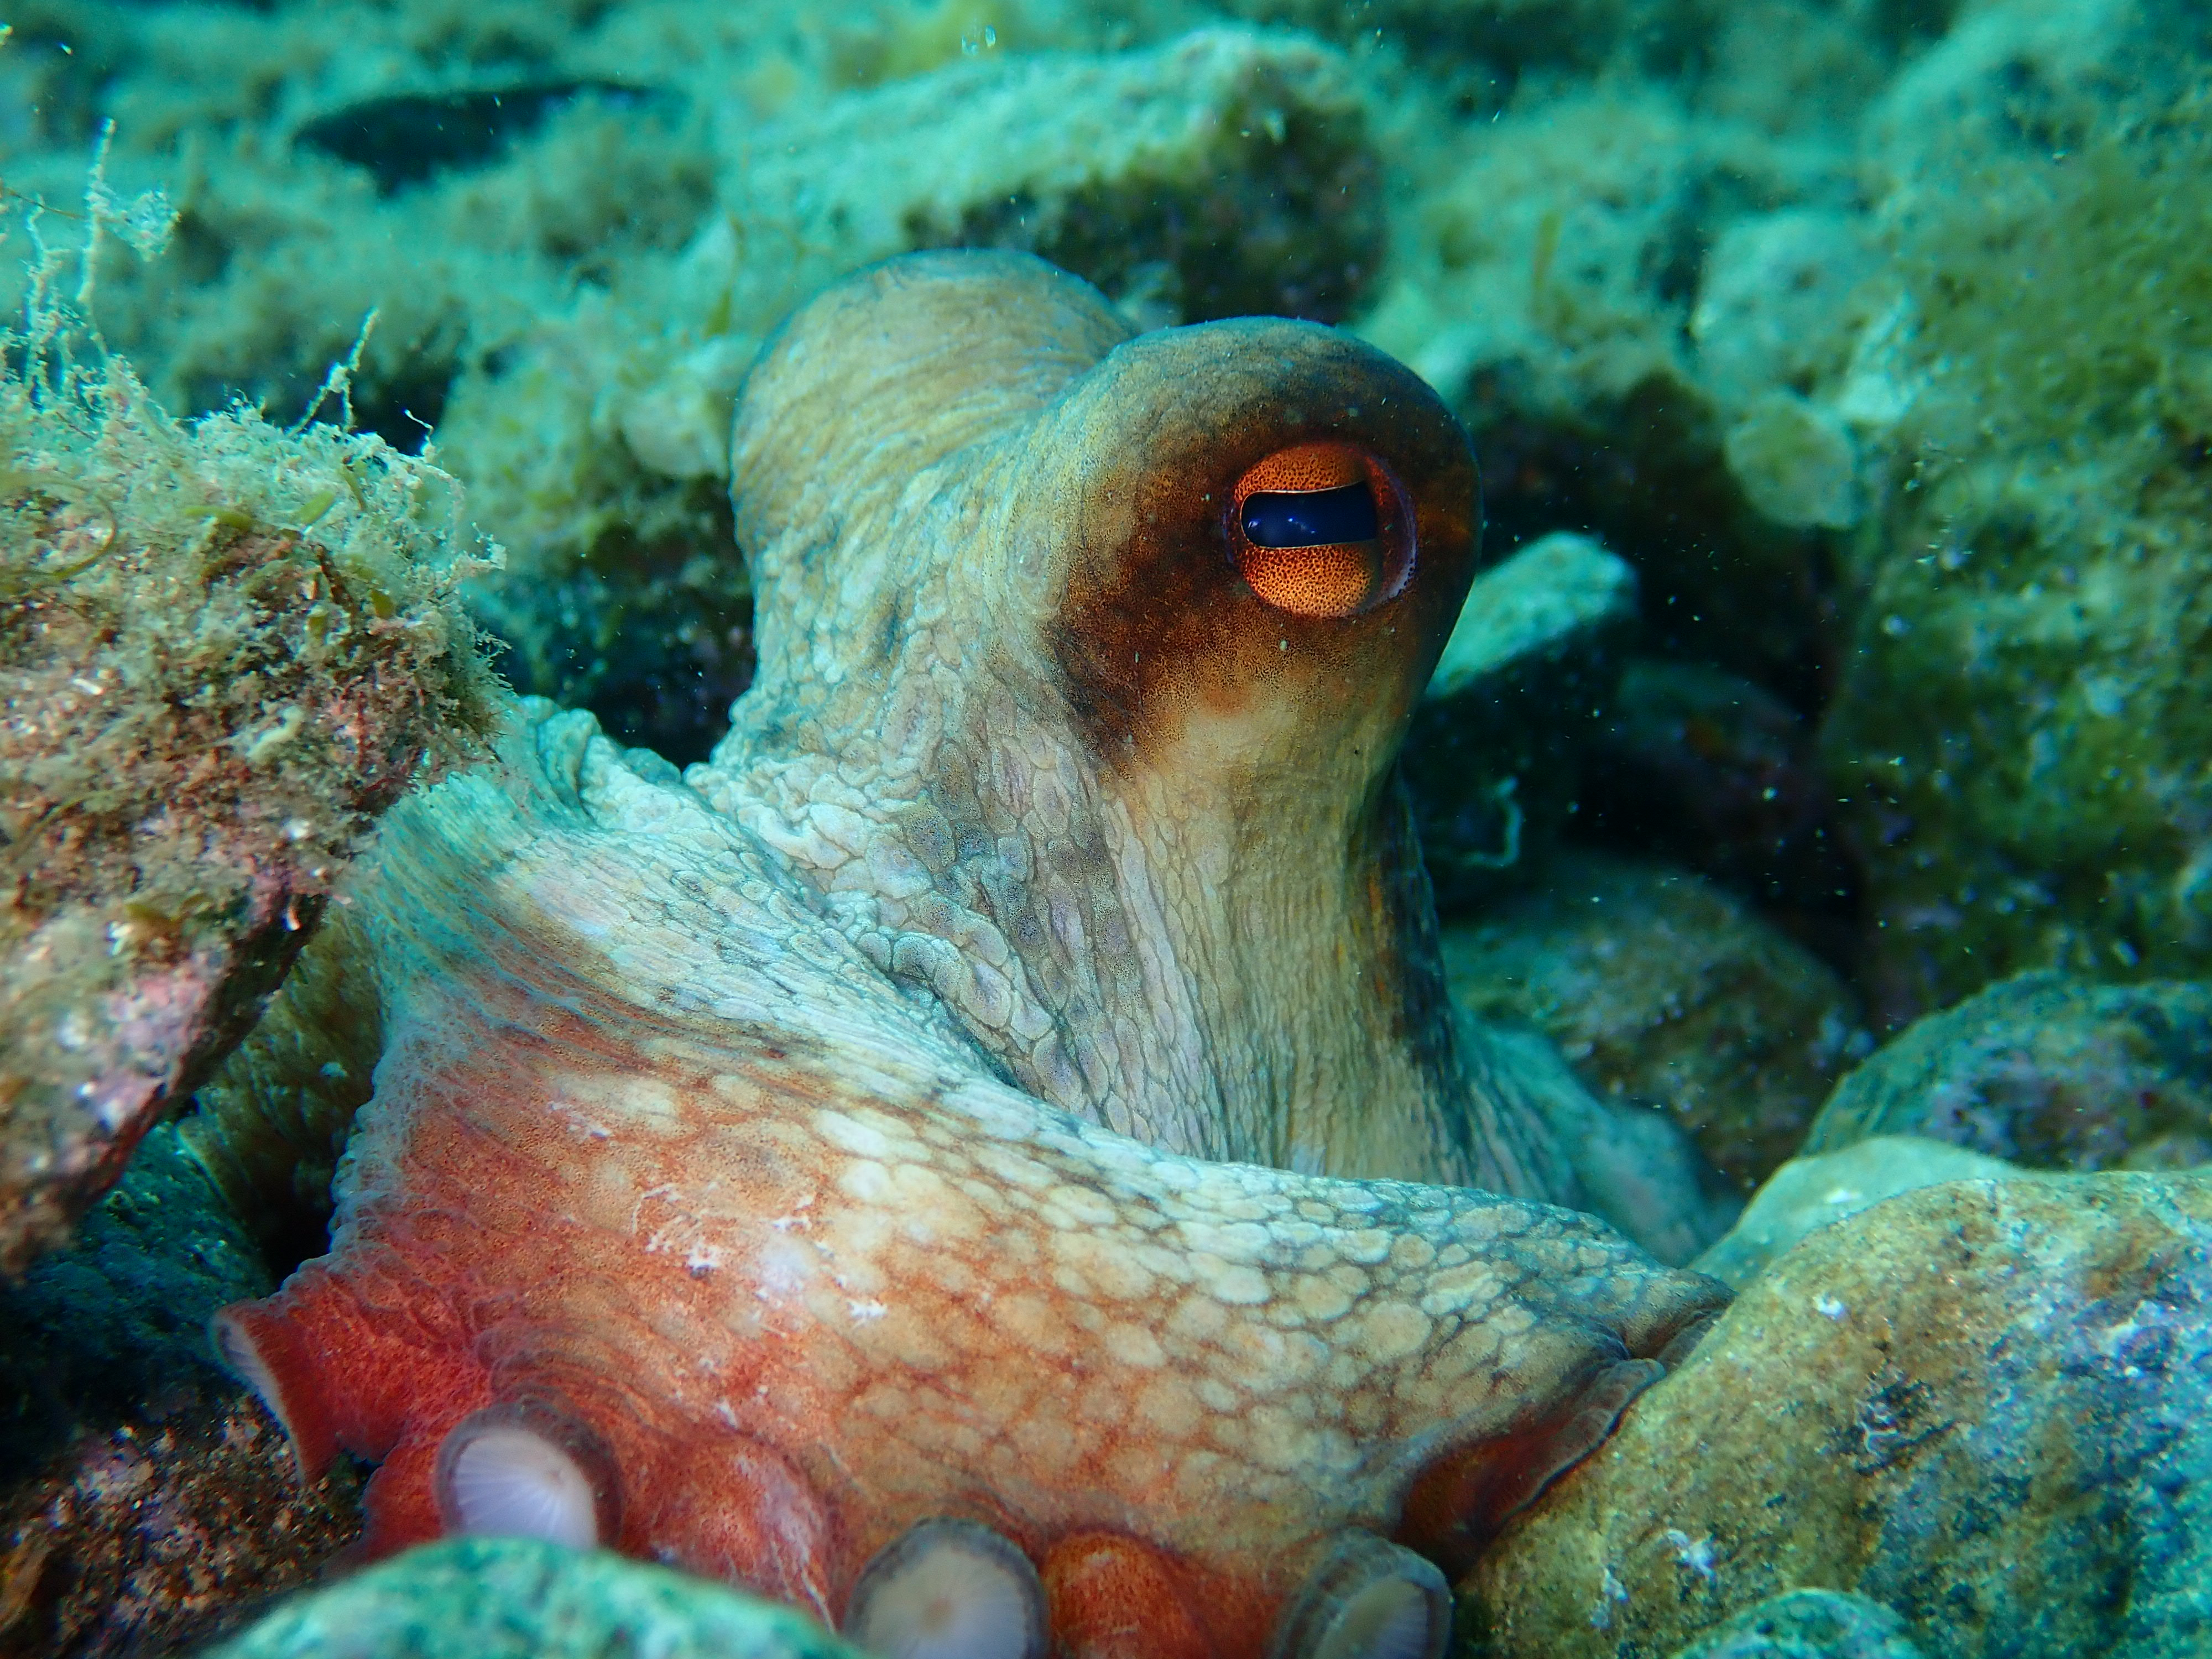 Poulpe - Aquablue - Banyuls-sur-mer